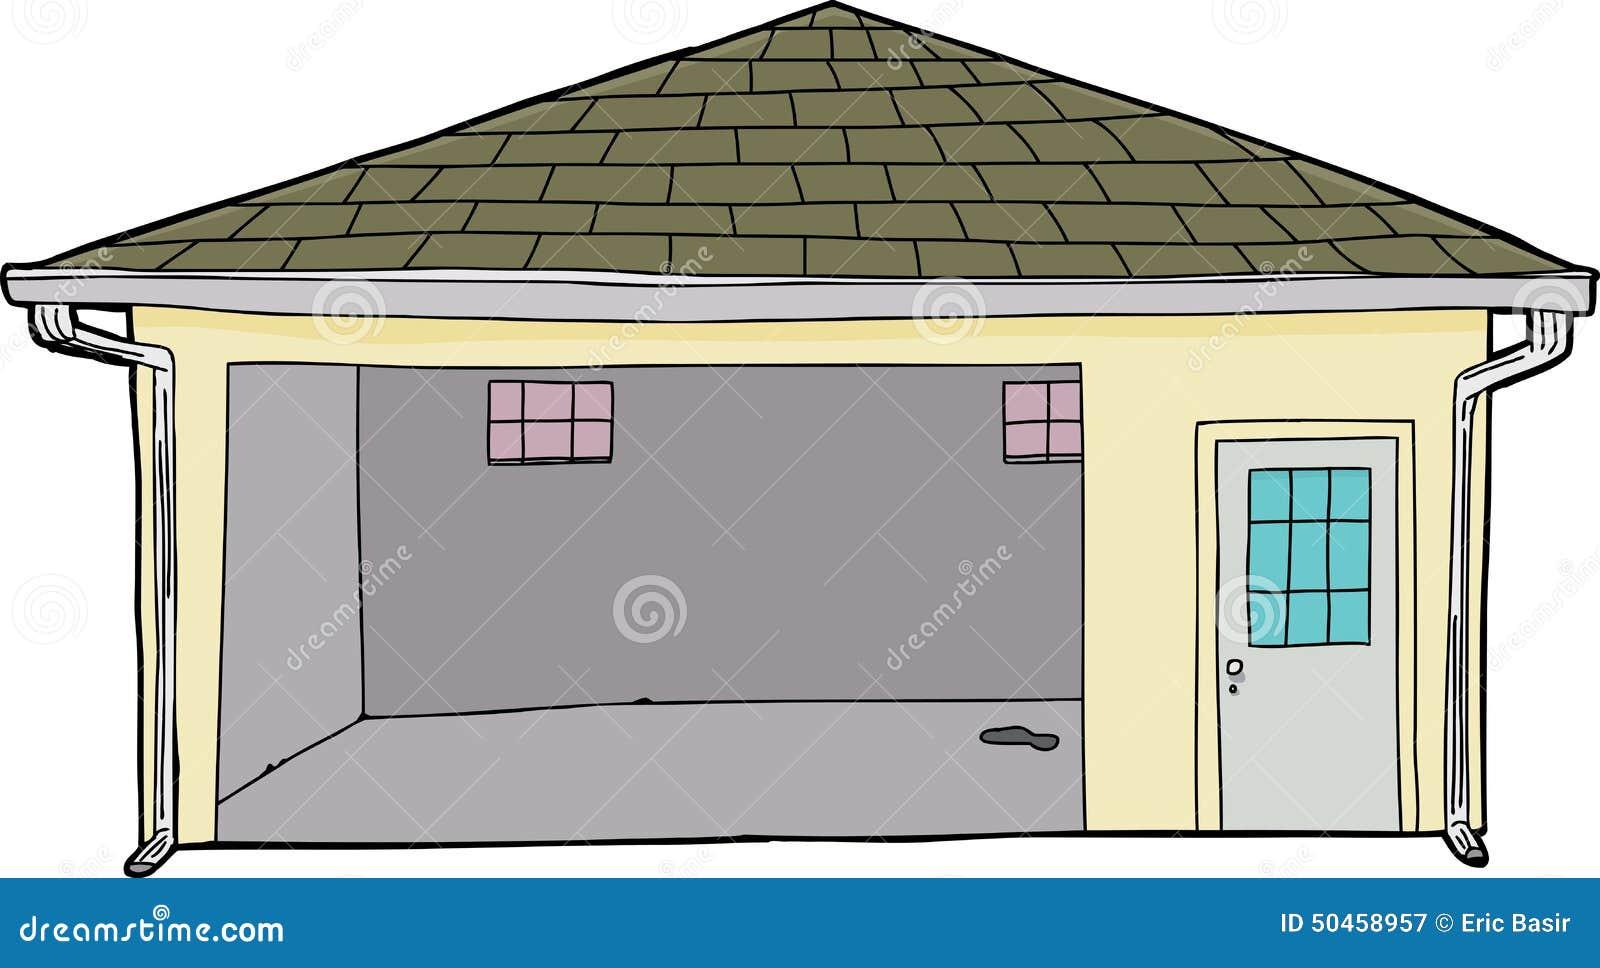 Garage door clip art - Isolated Single Open Garage Stock Illustration Image